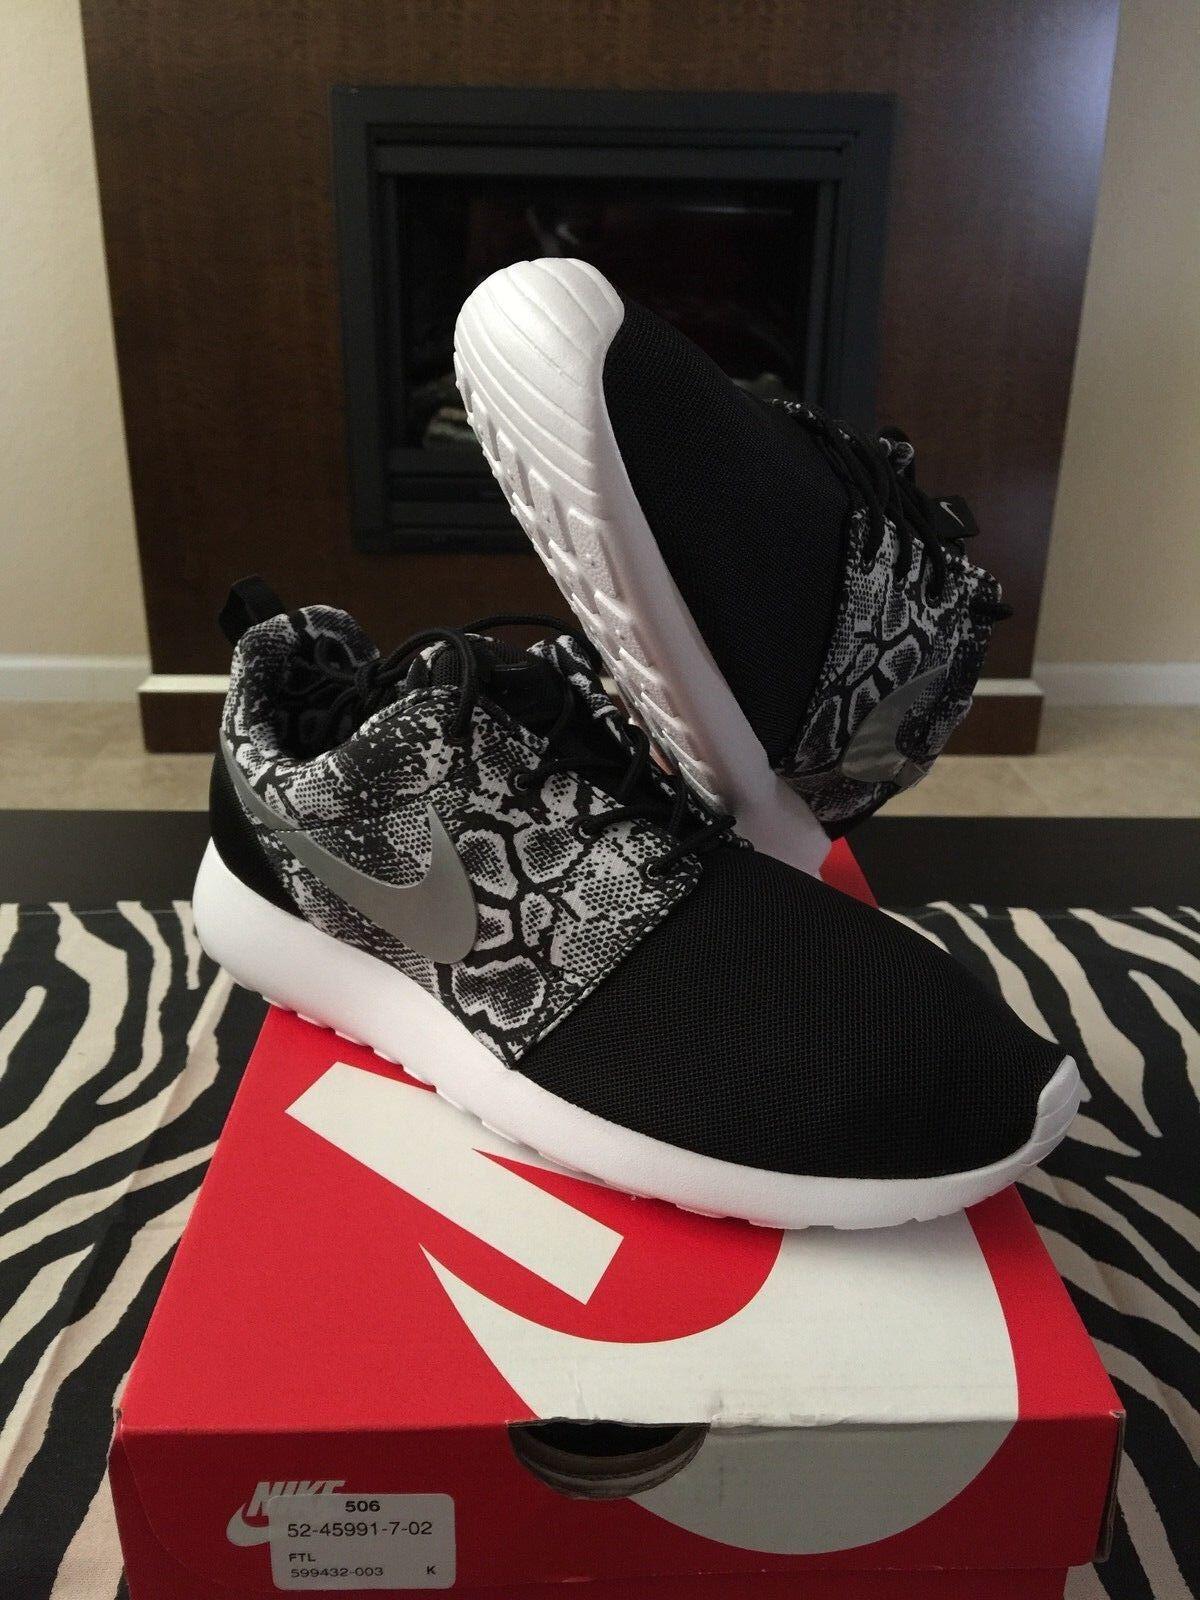 Nike - flex flex flex formatore 7 impronta donne 898481-100 ortensie formazione scarpe taglia 62c088